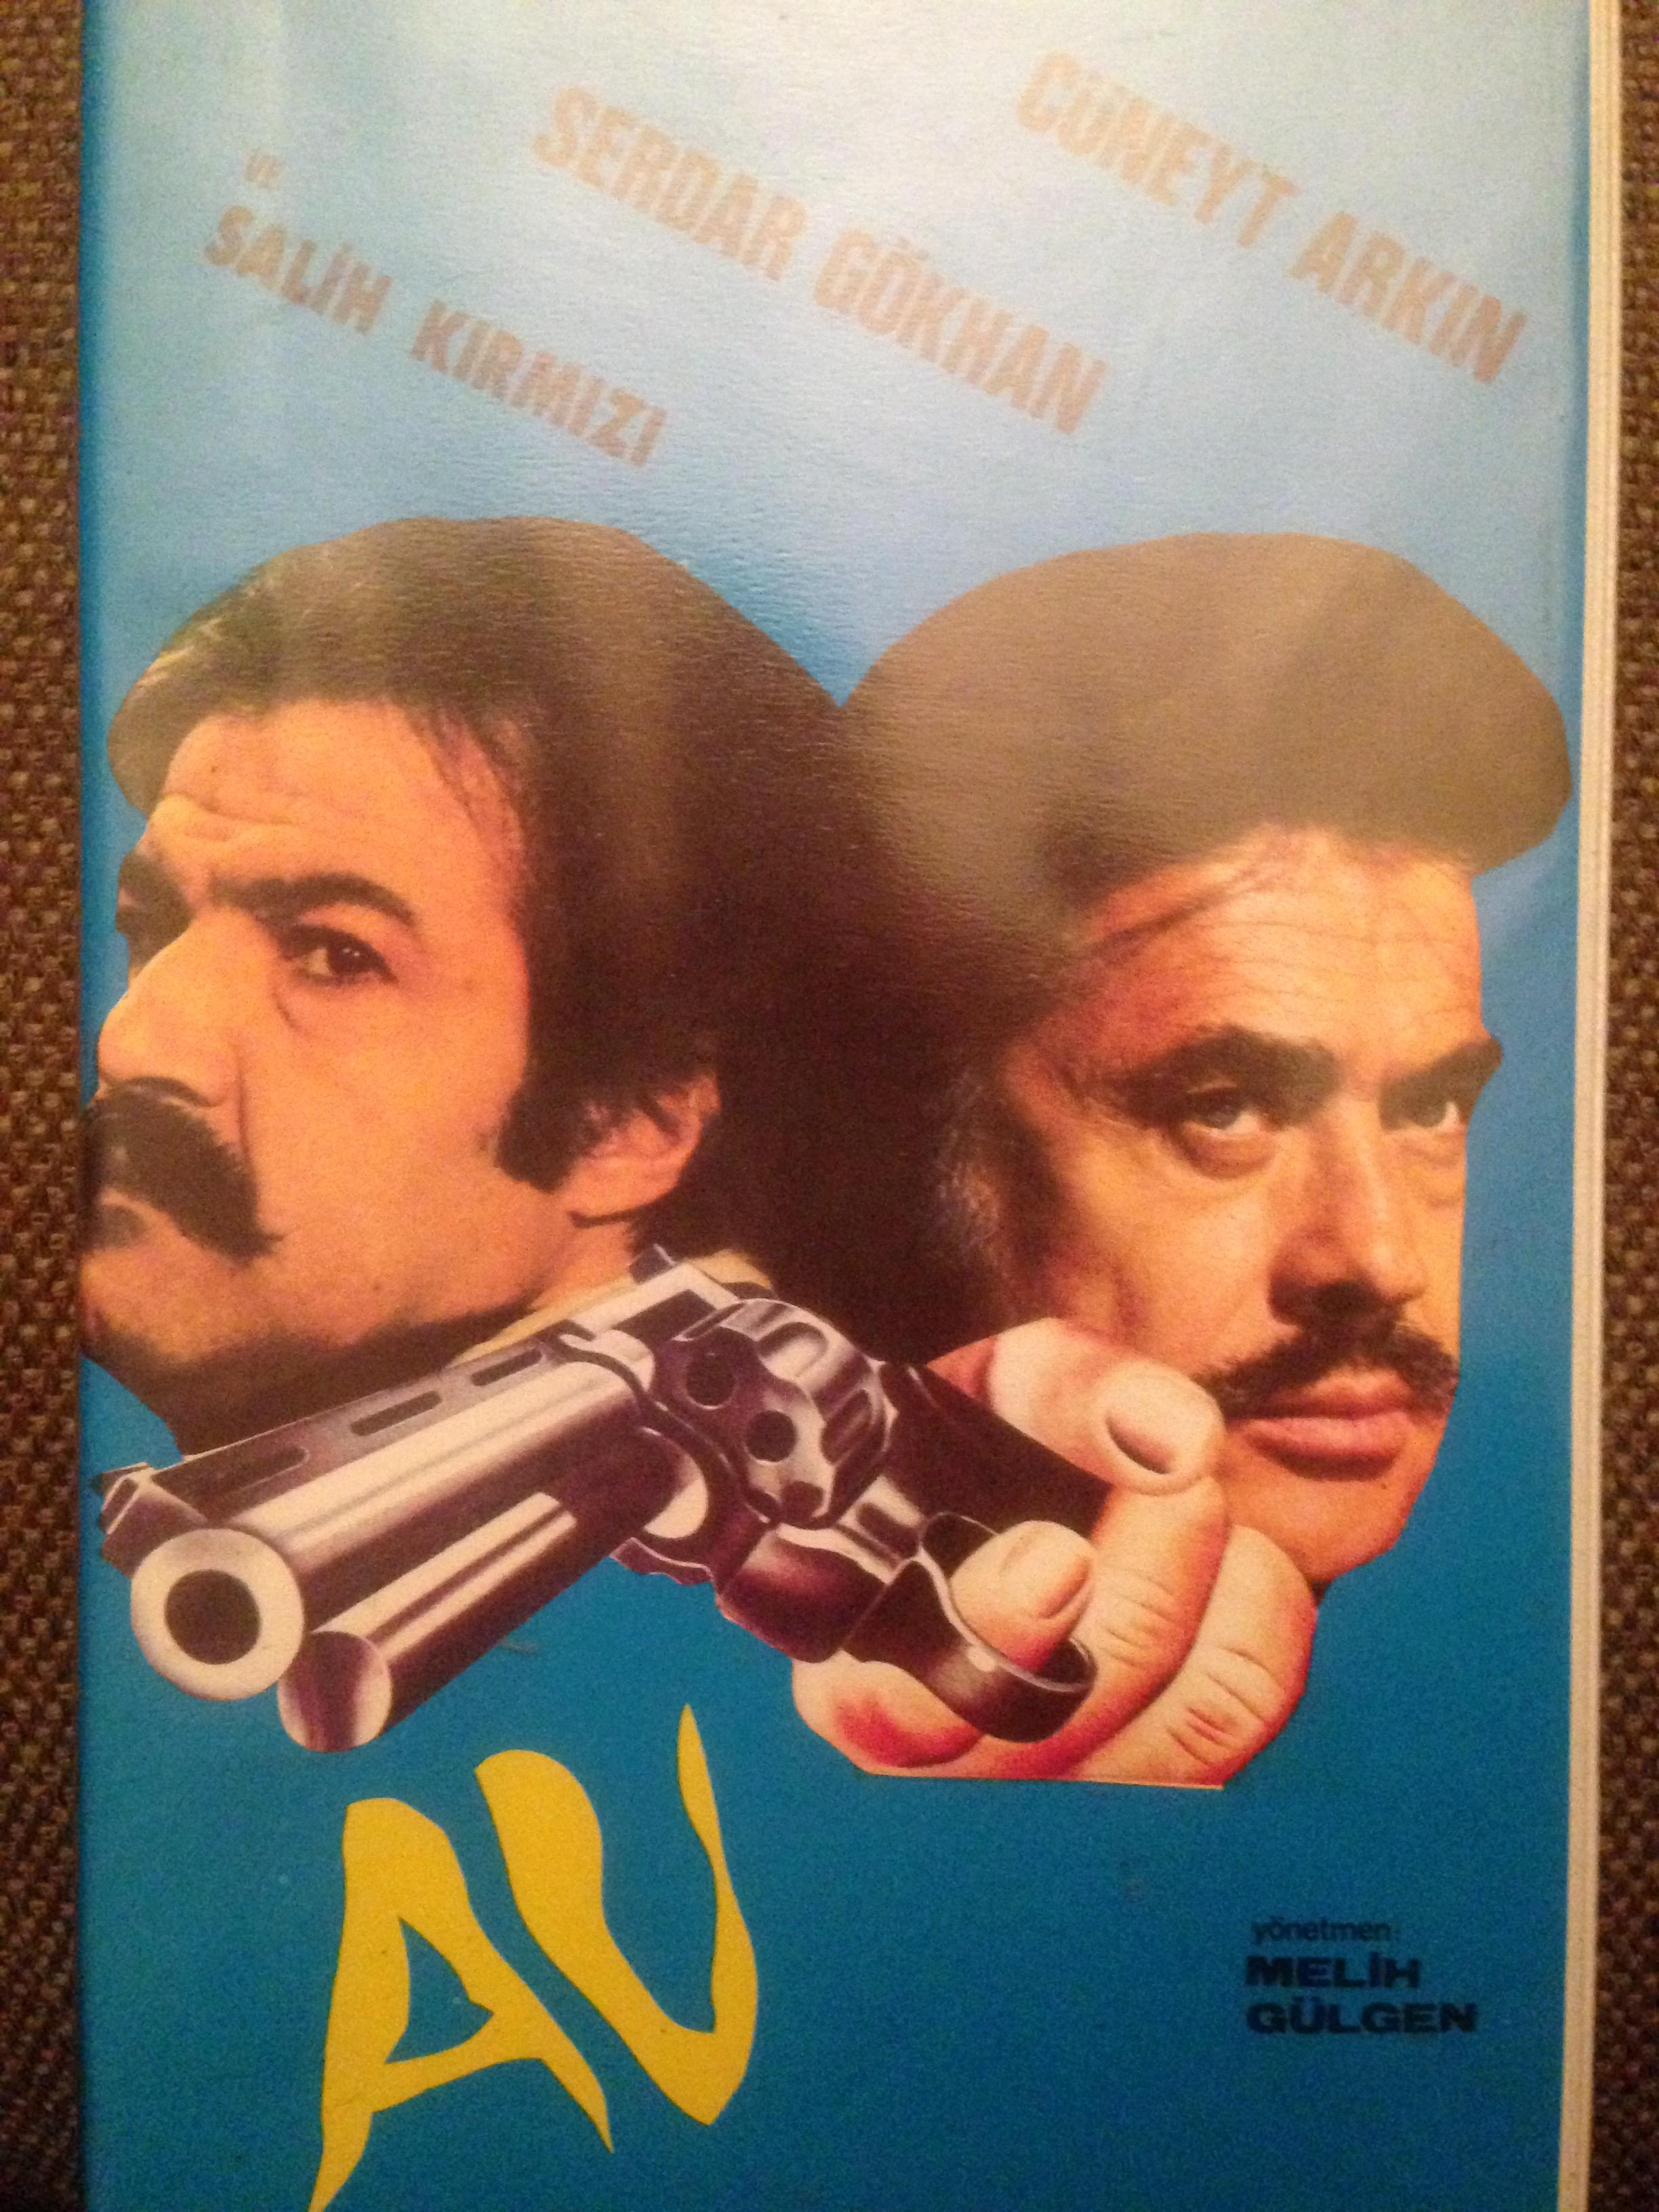 Av ((1989))